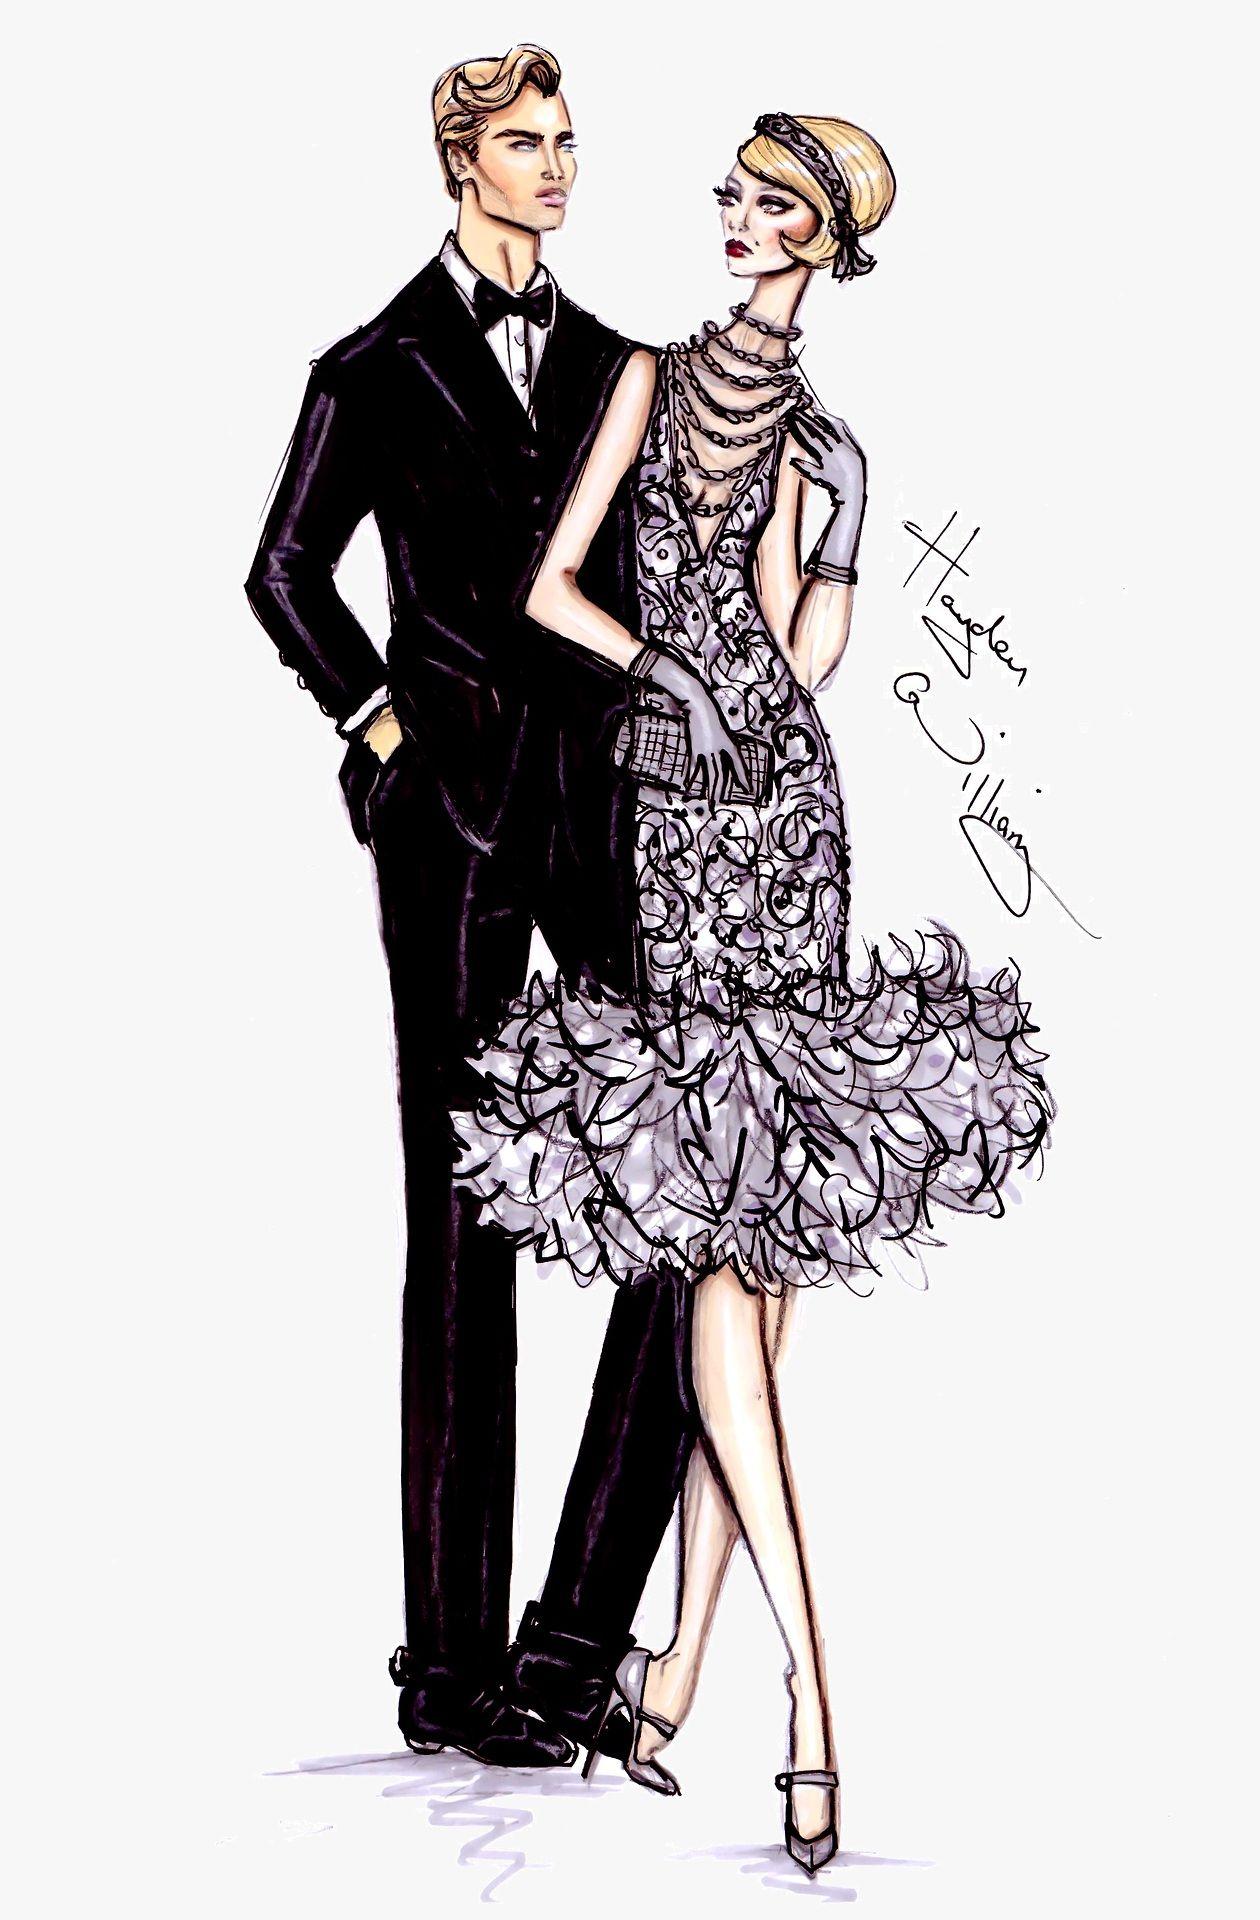 La moda de The Great Gatsby - Blog Mosca Footwear